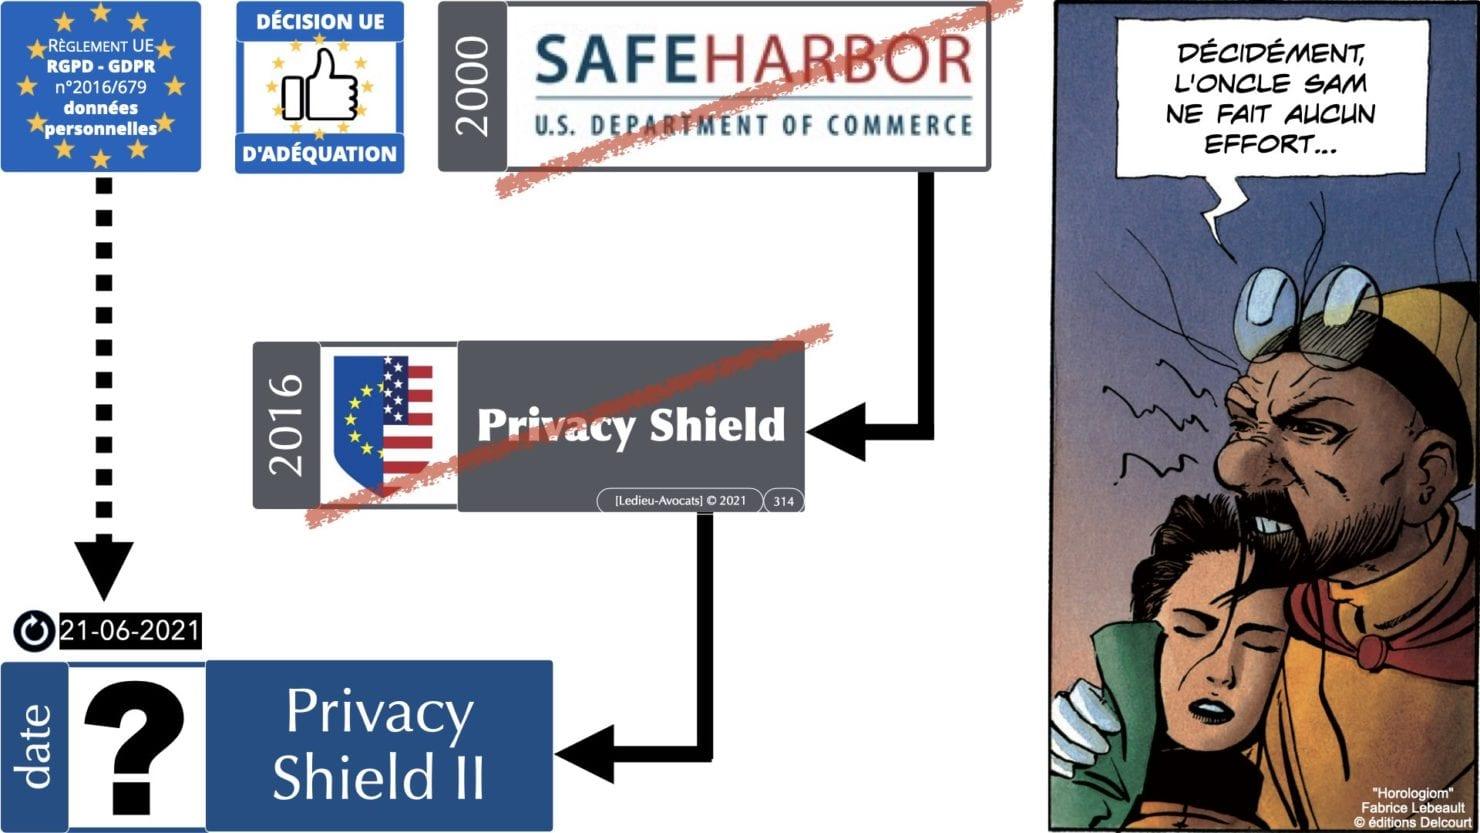 RGPD e-Privacy principes actualité jurisprudence ©Ledieu-Avocats 25-06-2021.314